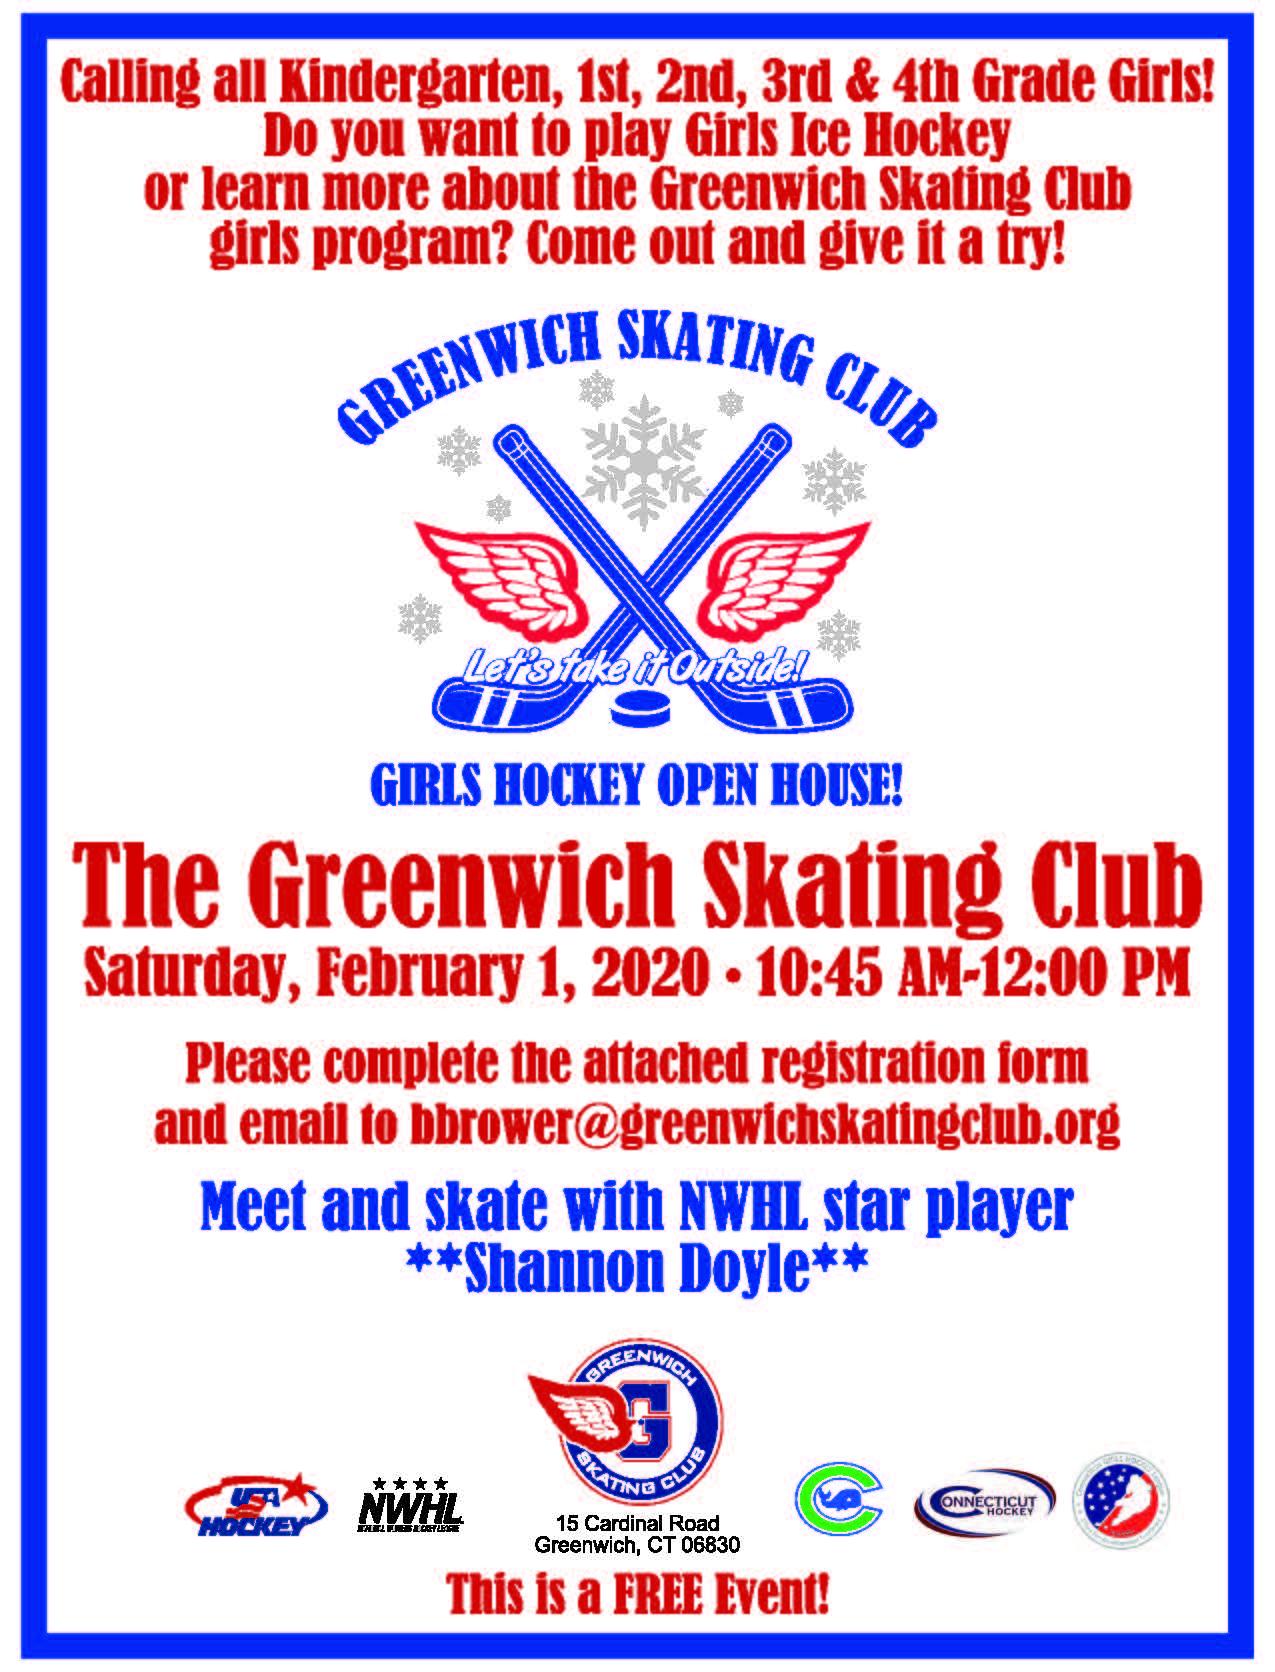 Girls Hockey Open House